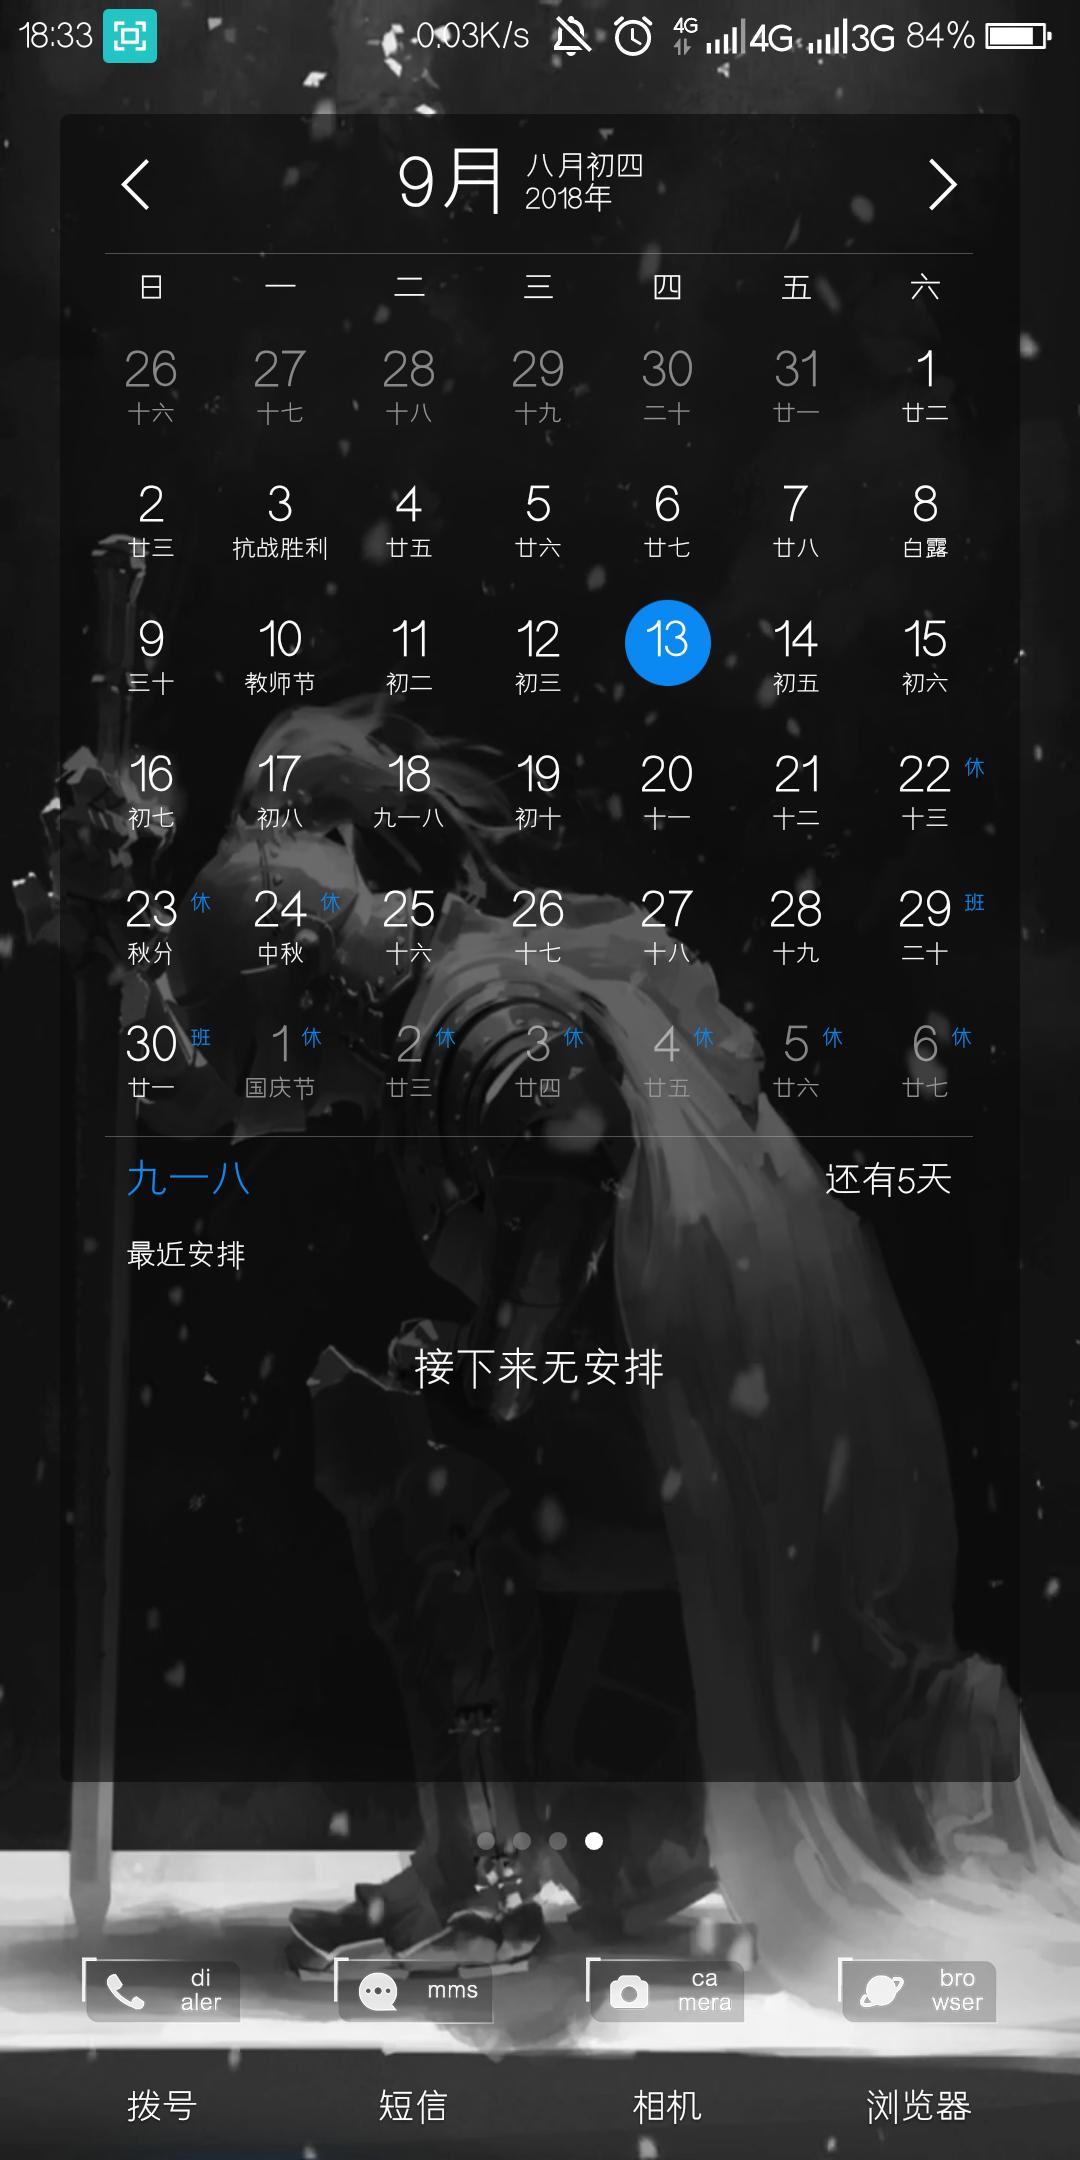 Screenshot_2018-09-13-18-33-06.png